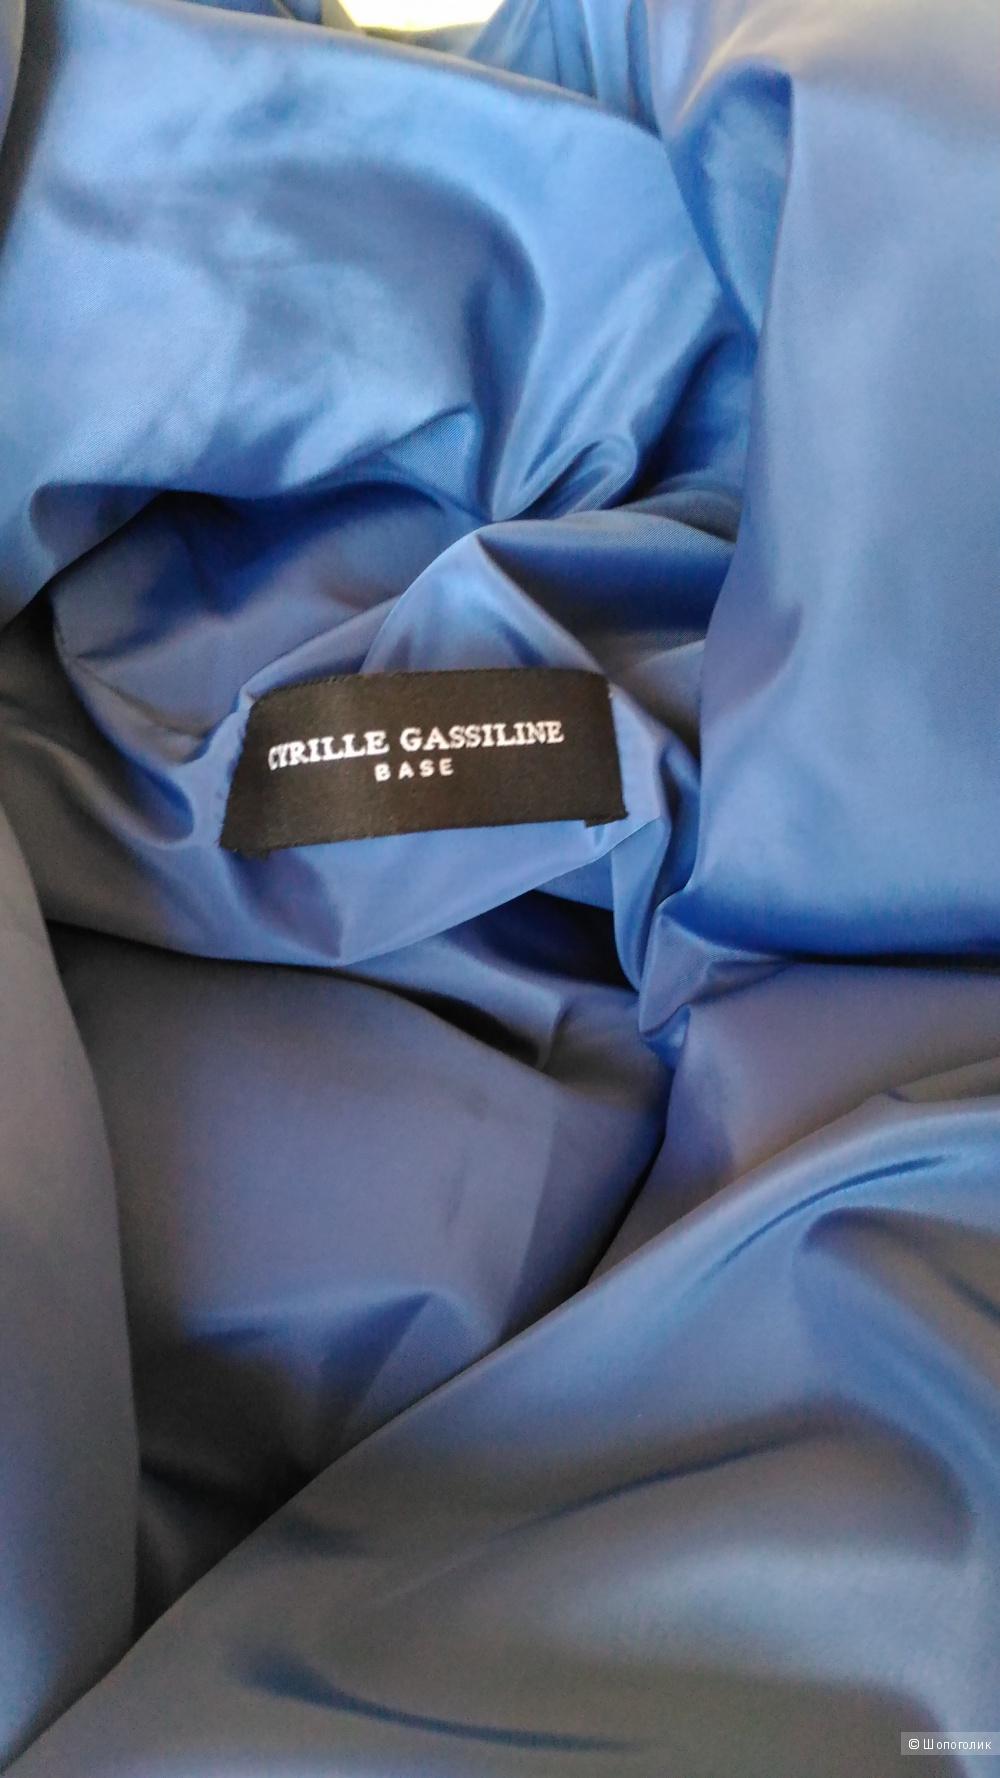 Пуховик-одеяло Cyrille Gassiline, размер S-M